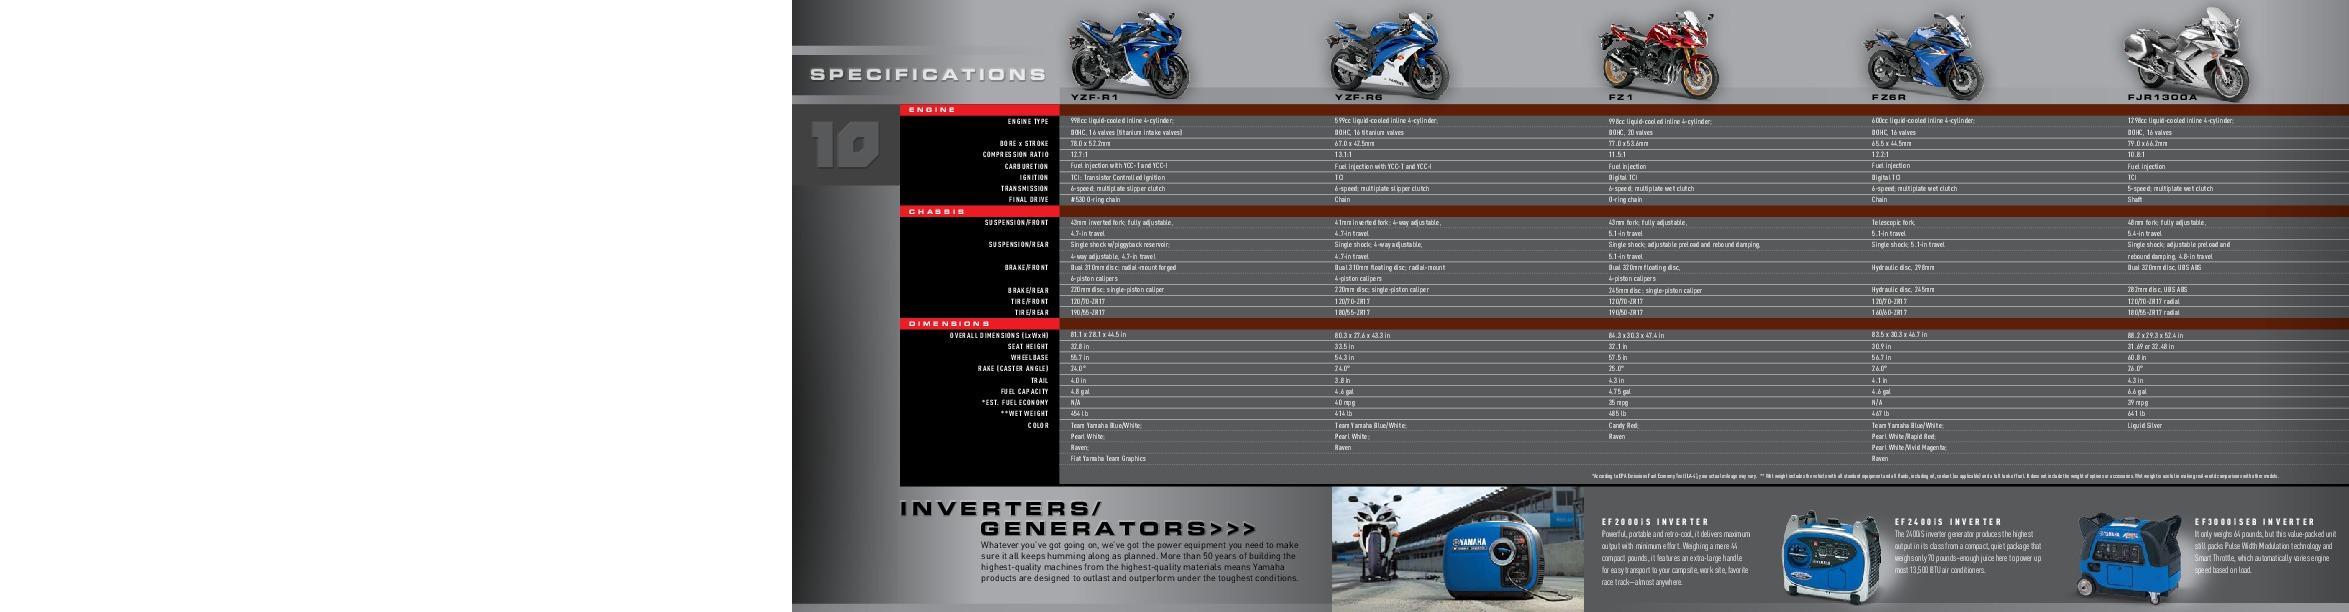 2010 yamaha r6 service manual pdf